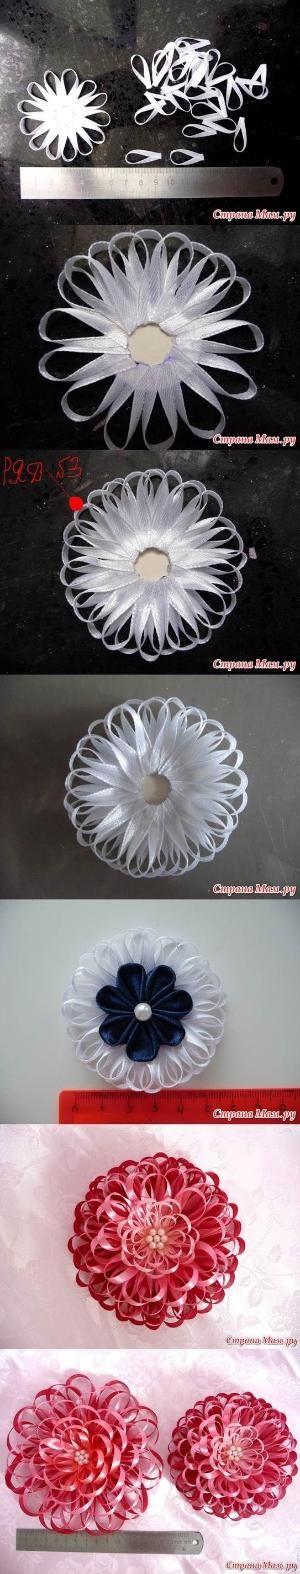 DIY Narrow Satin Ribbon Flower 2 by Kat Gonzalez